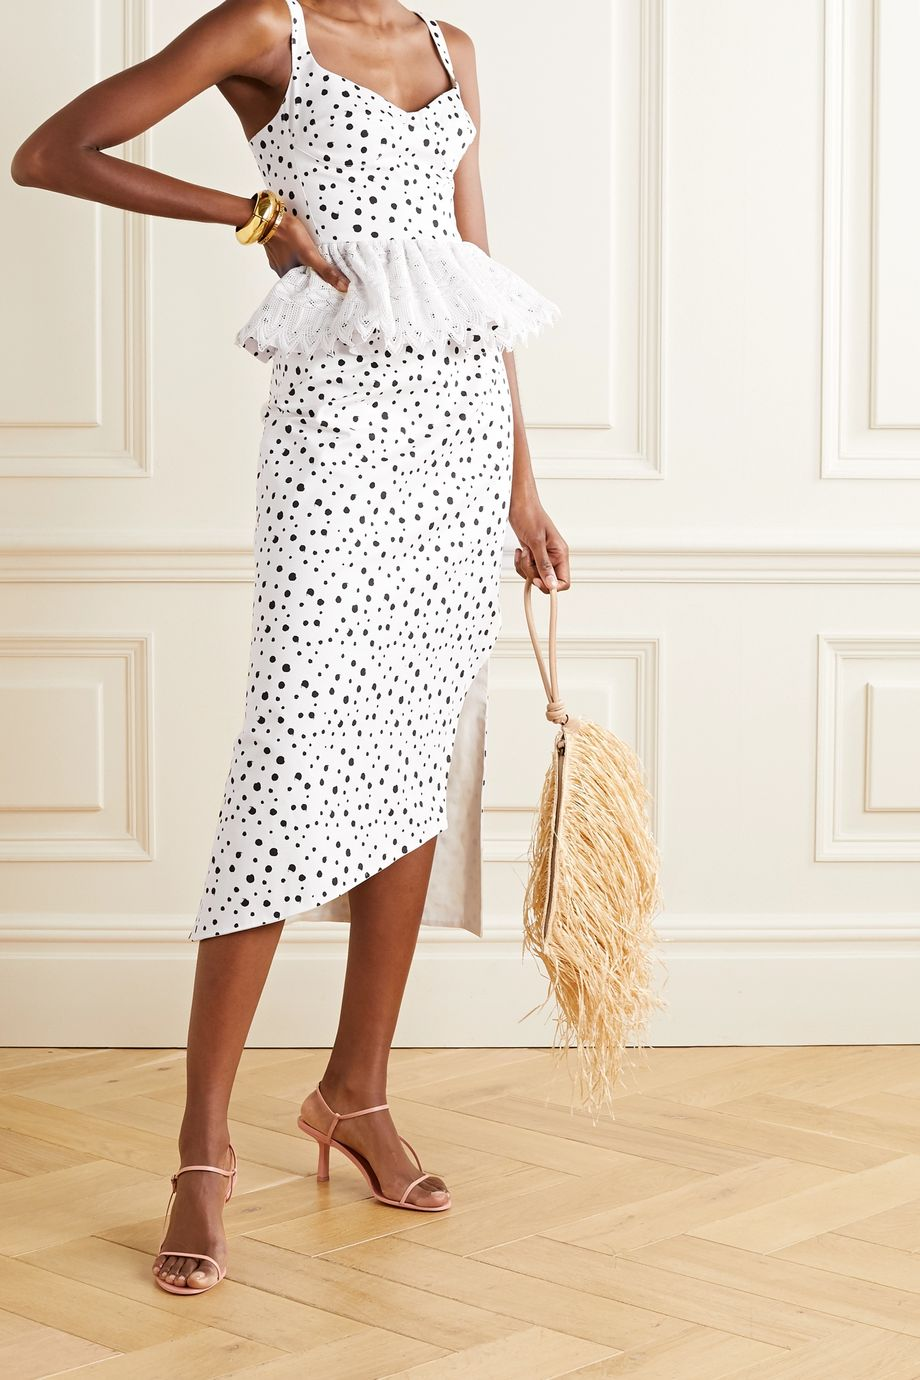 Silvia Tcherassi La Banquera crochet-trimmed polka-dot cotton-blend peplum top